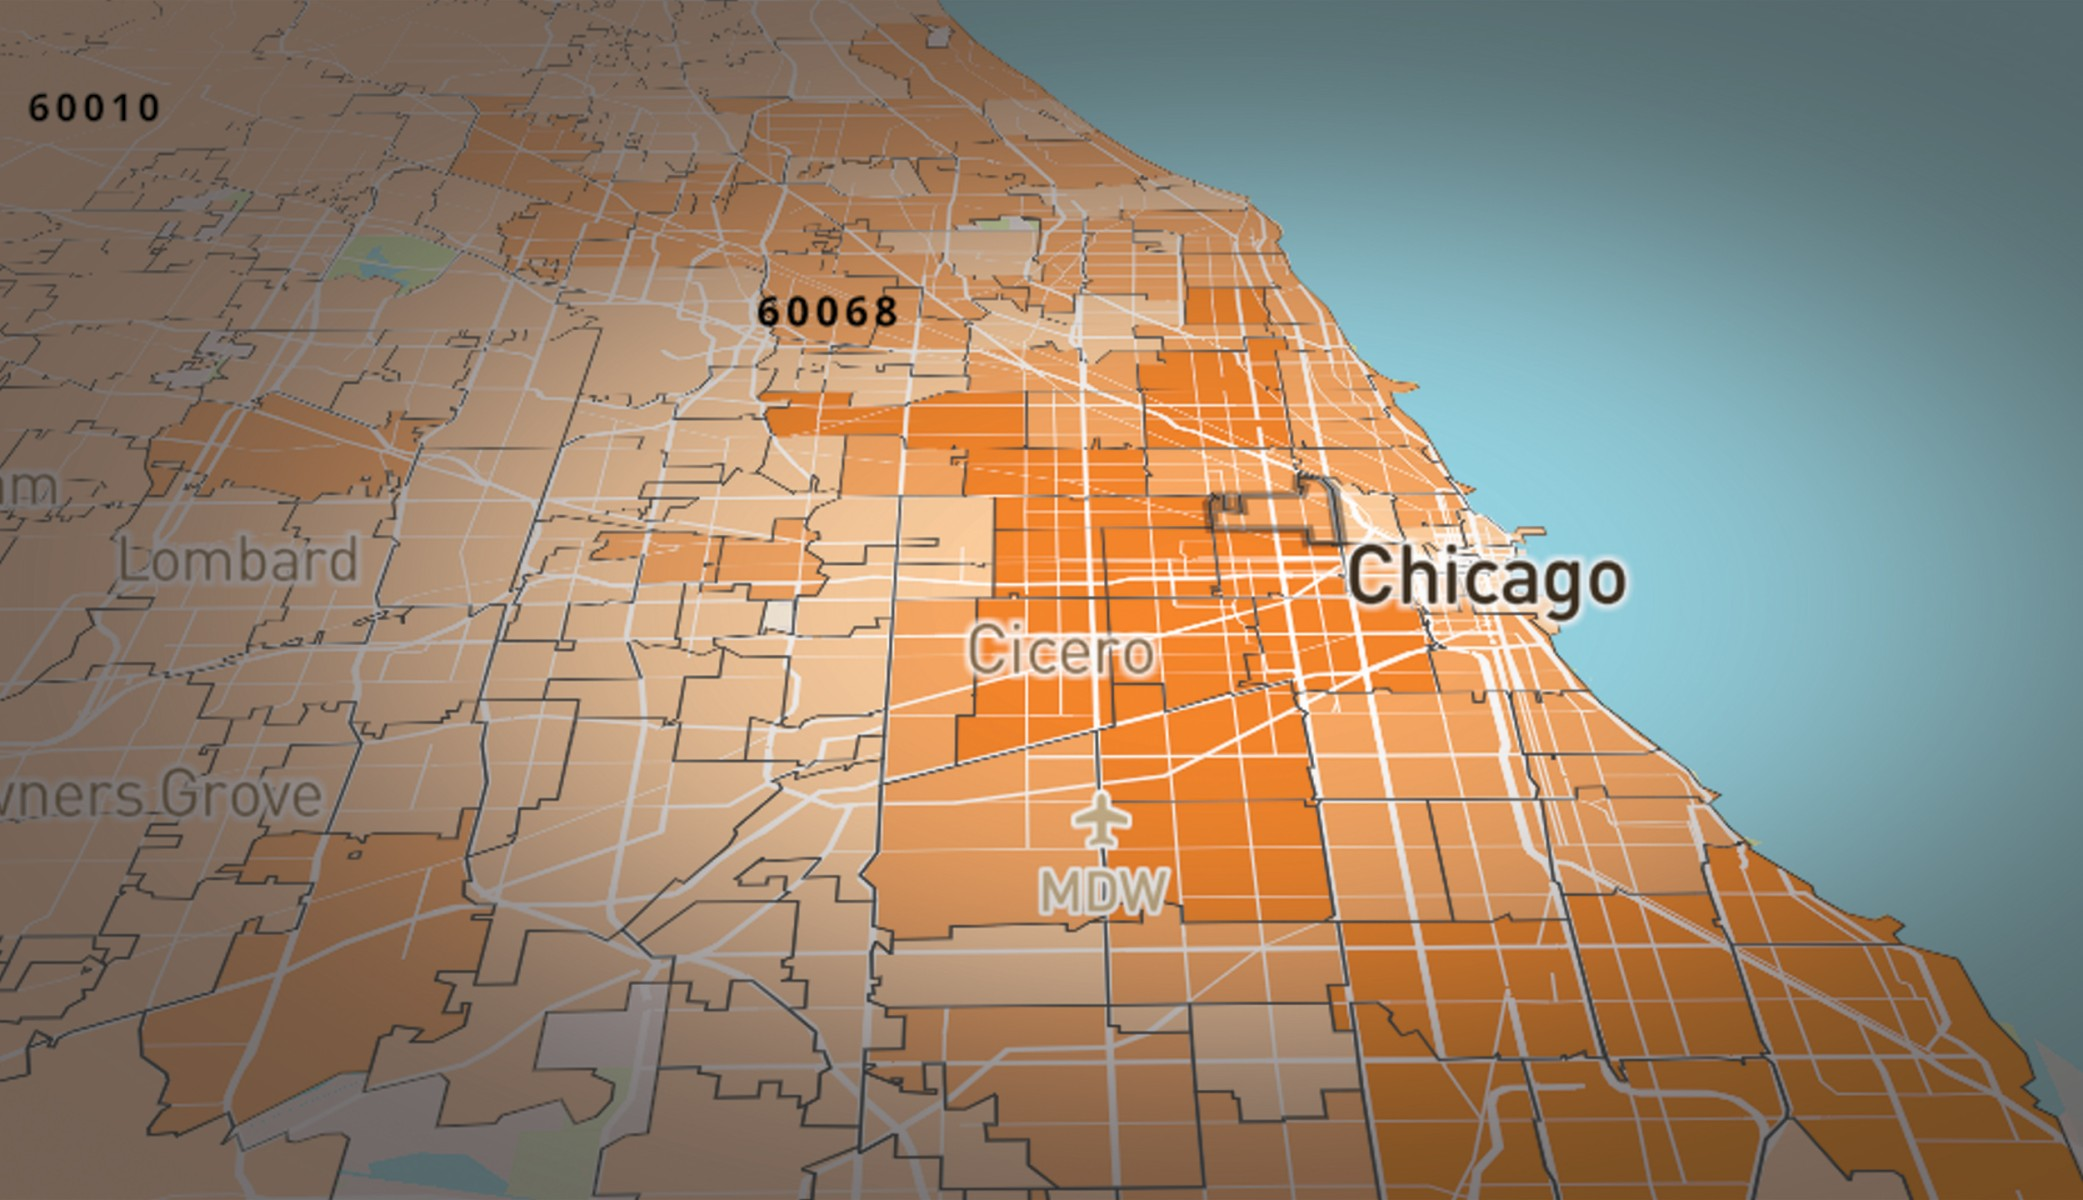 Map By Zip Code Of Coronavirus Covid 19 Cases Illinois Wbez Chicago